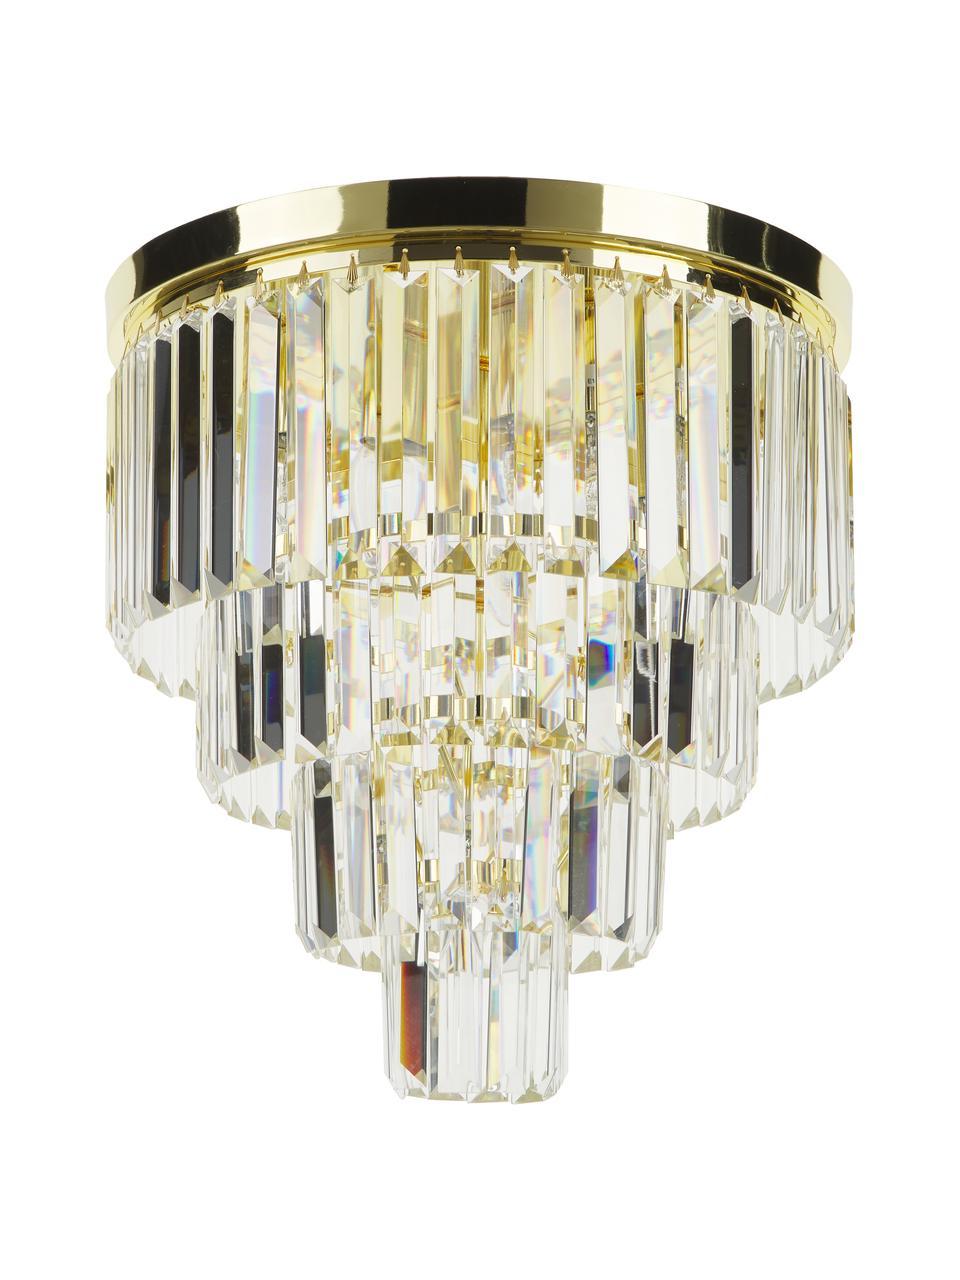 Lampadario in vetro Gracja, Paralume: vetro, Struttura: metallo, Dorato, trasparente, Ø 40 x Alt. 40 cm